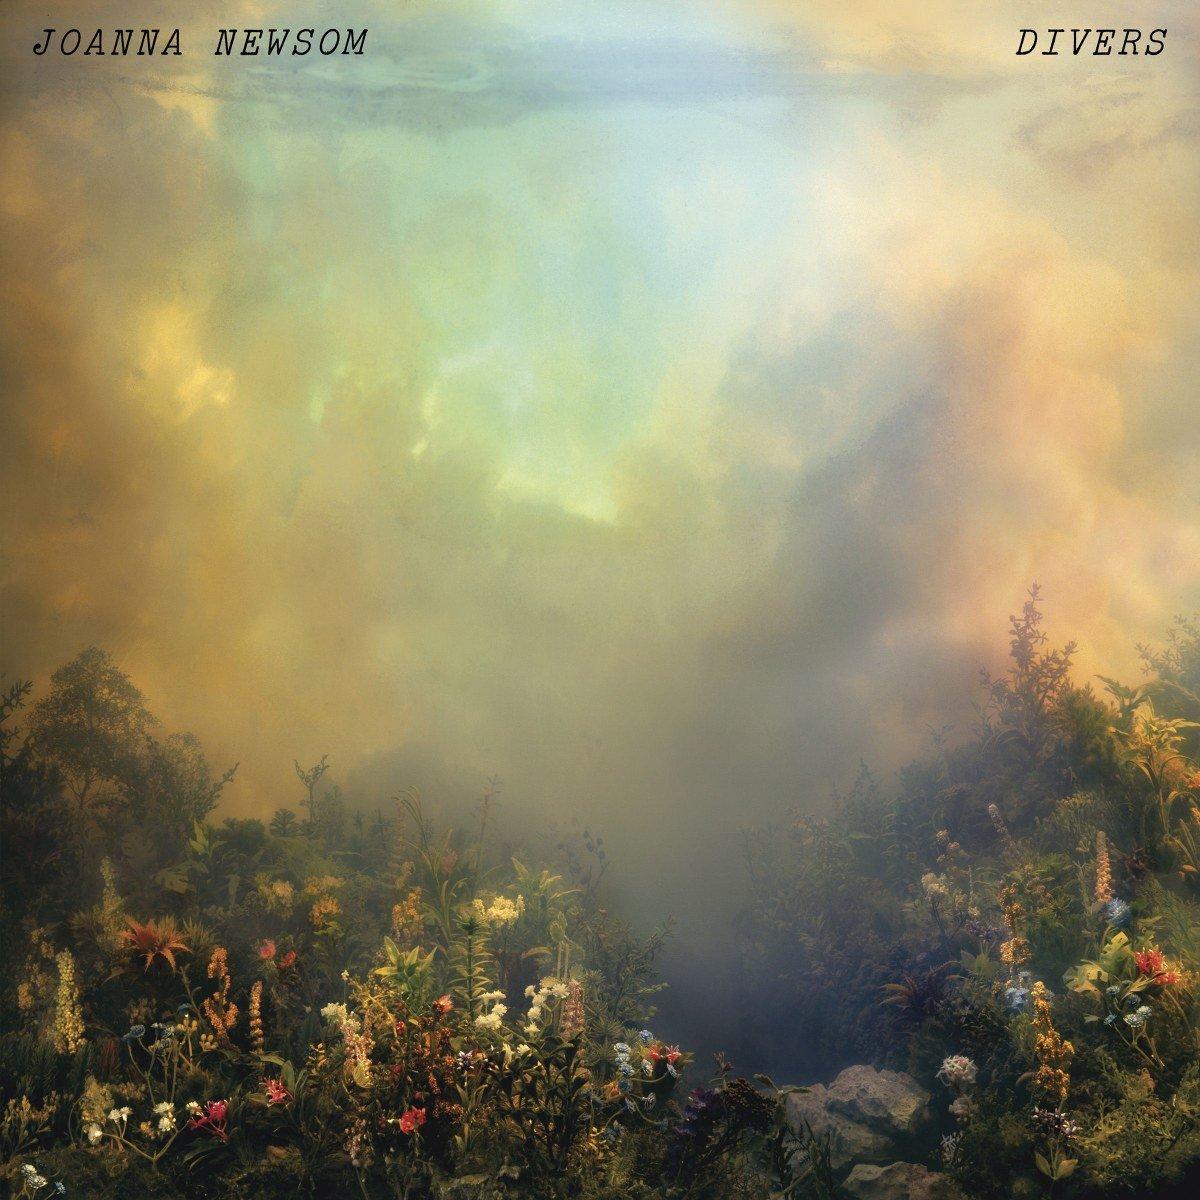 Divers (Vinyl)